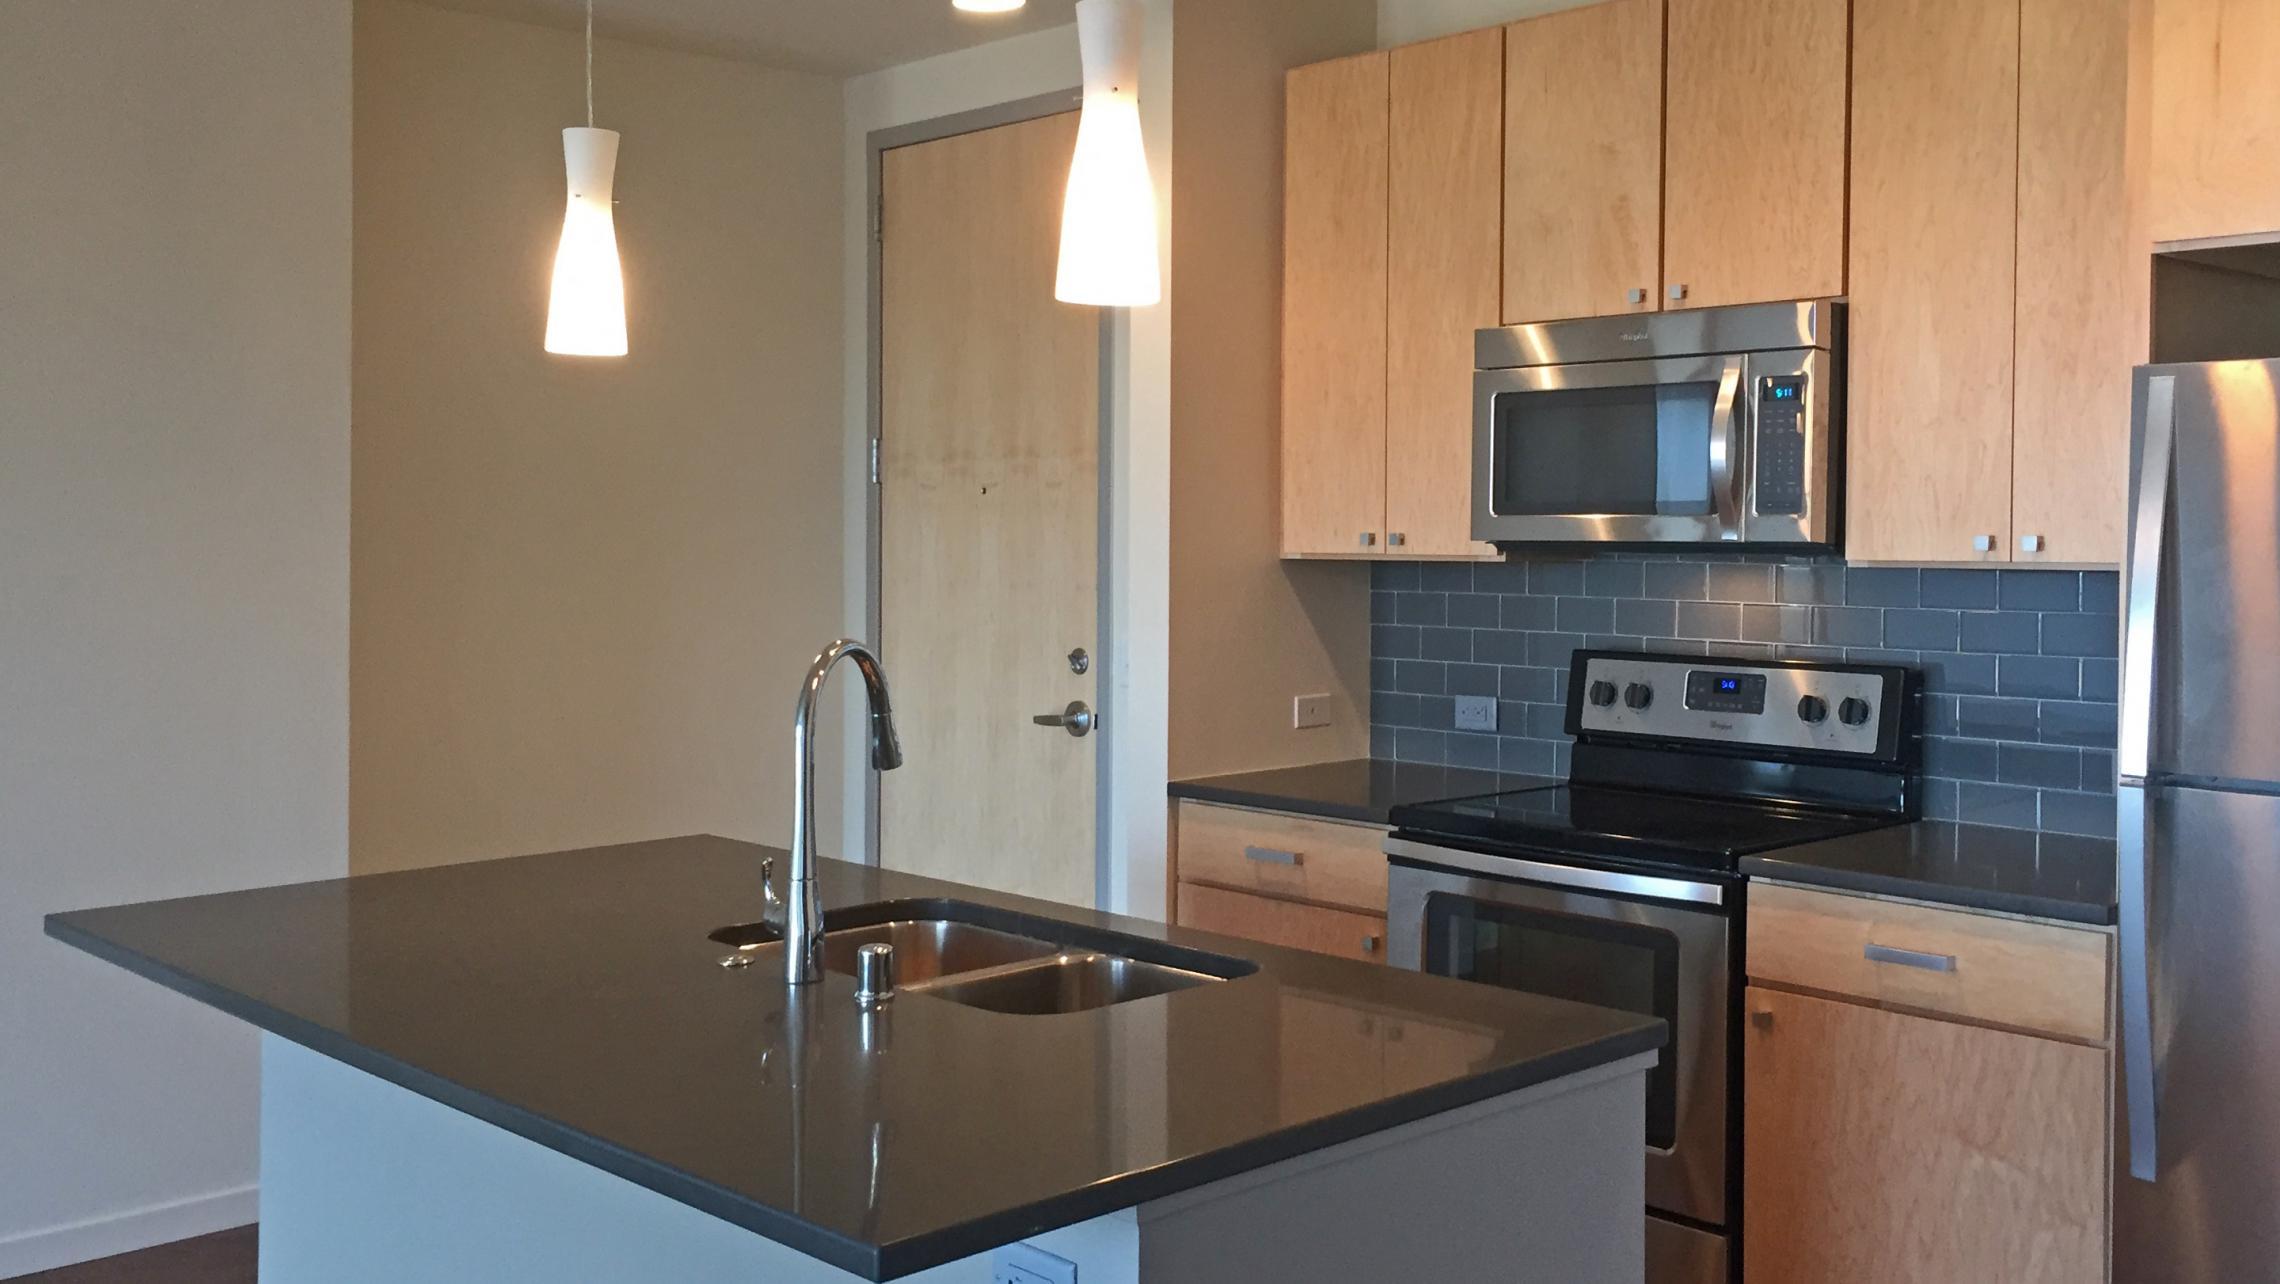 ULI Nine Line Apartment 519 - Kitchen Stainless Steel Appliances